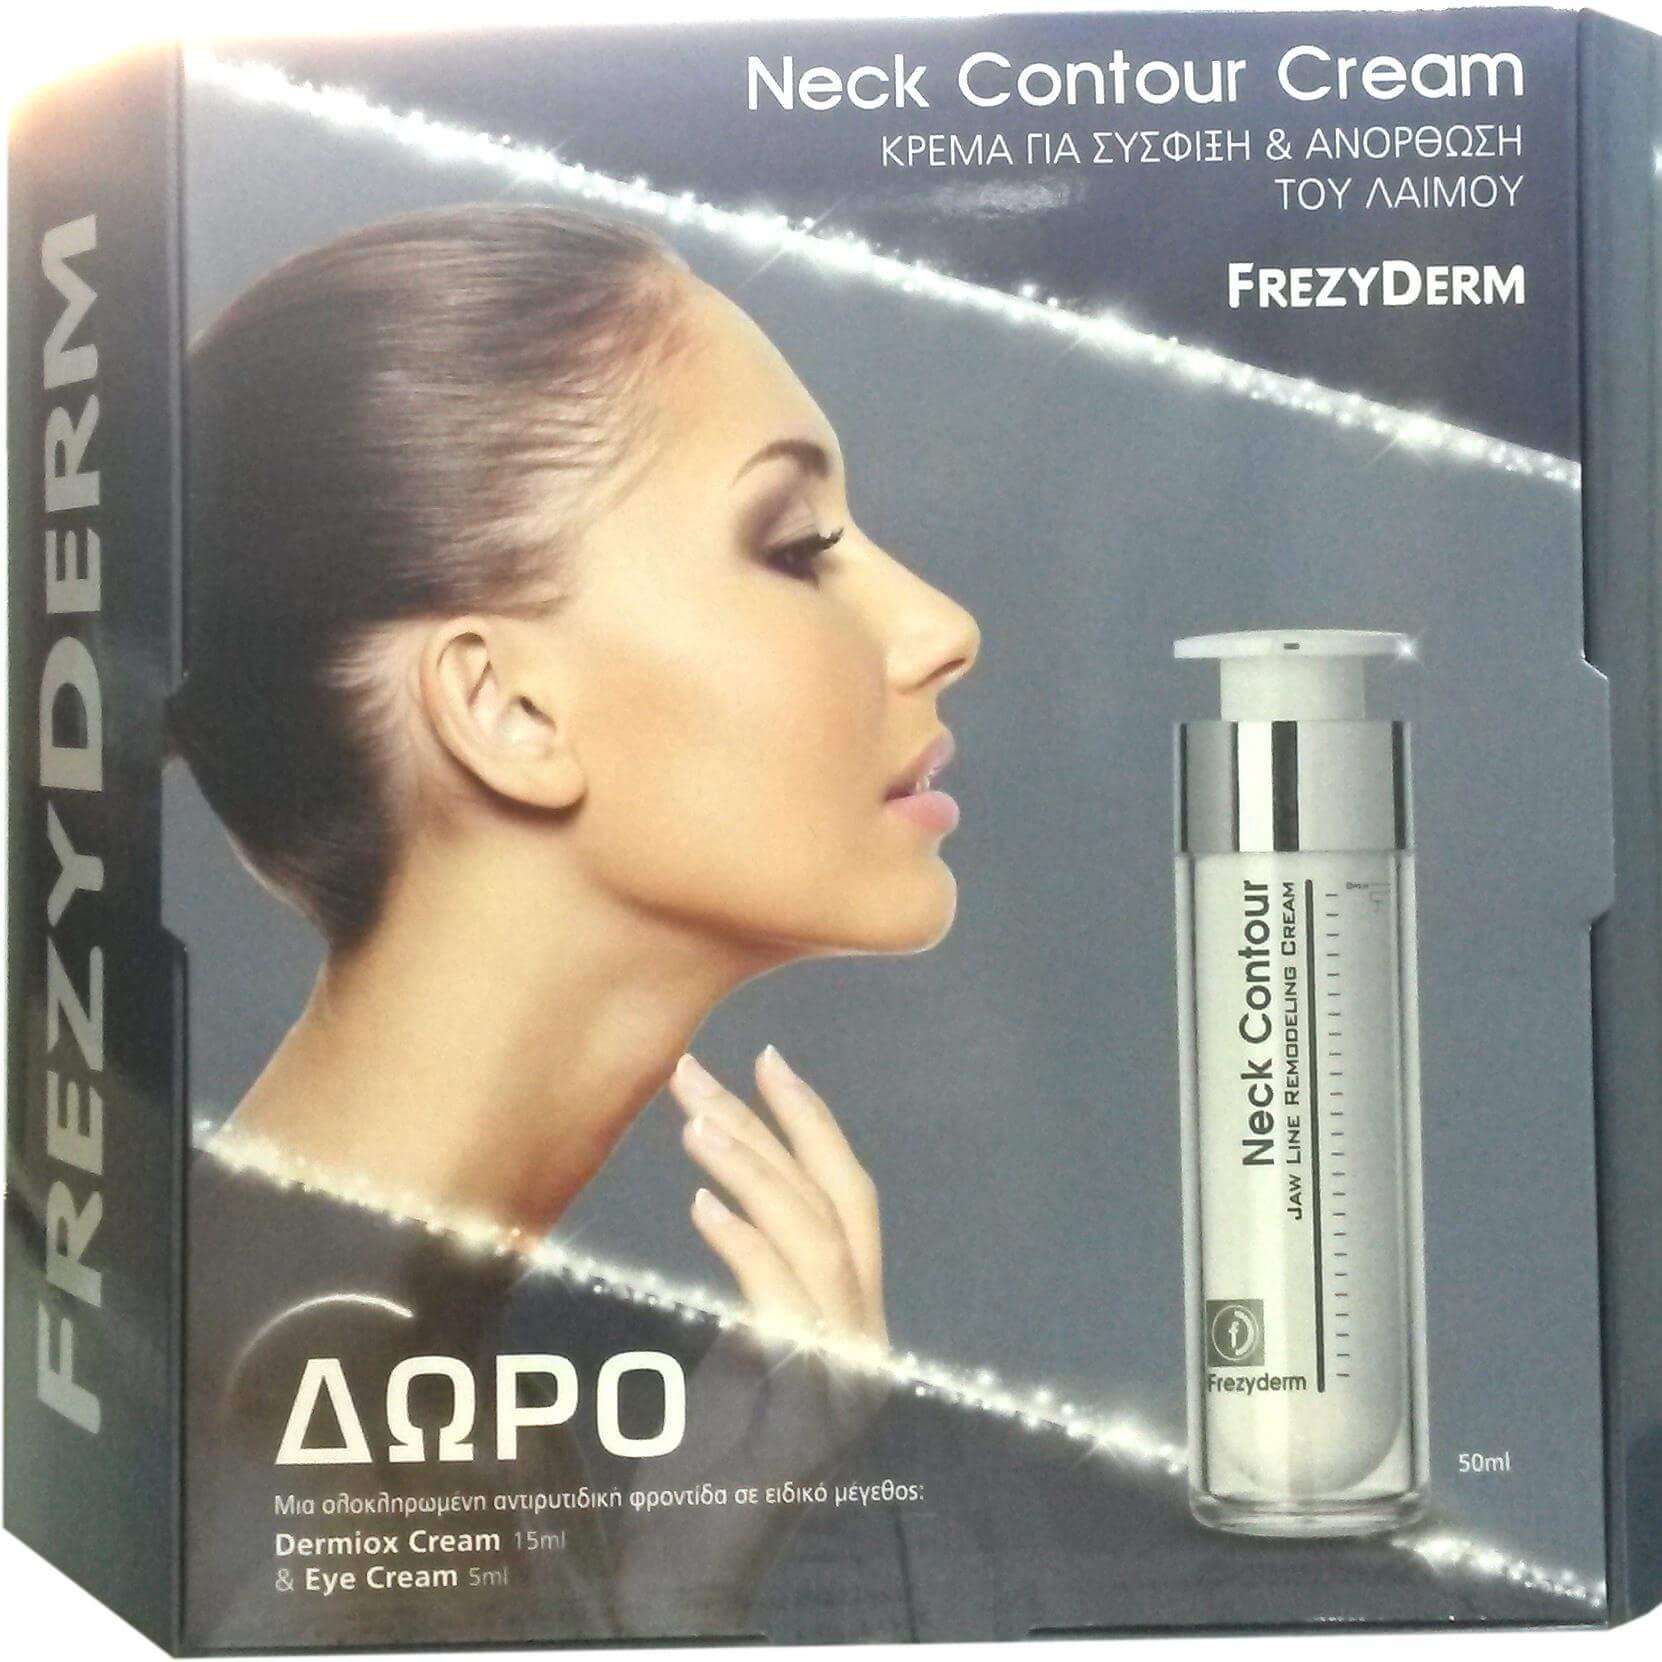 Frezyderm Πακέτο Προσφοράς Neck Contour Cream Κρέμα Σύσφιξης & Ανόρθωσης Λαιμού 50ml & Δώρο Dermiox Cream 15ml & Eye Cream 5ml